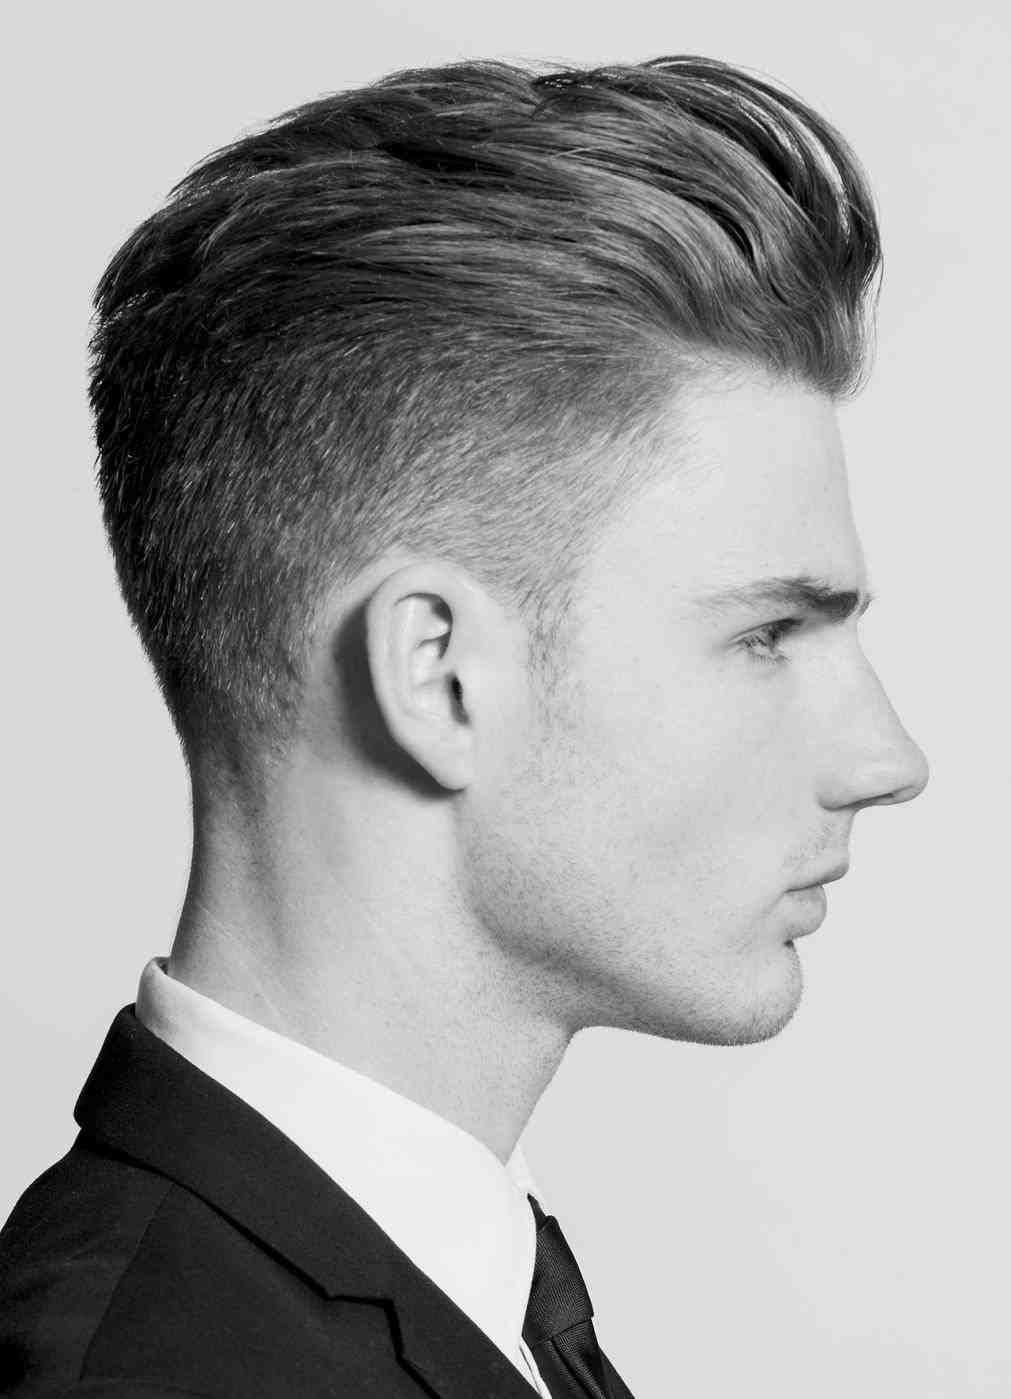 Image Result For Mens Haircut Back Rambut Pria Potongan Rambut Pria Gaya Rambut Pria